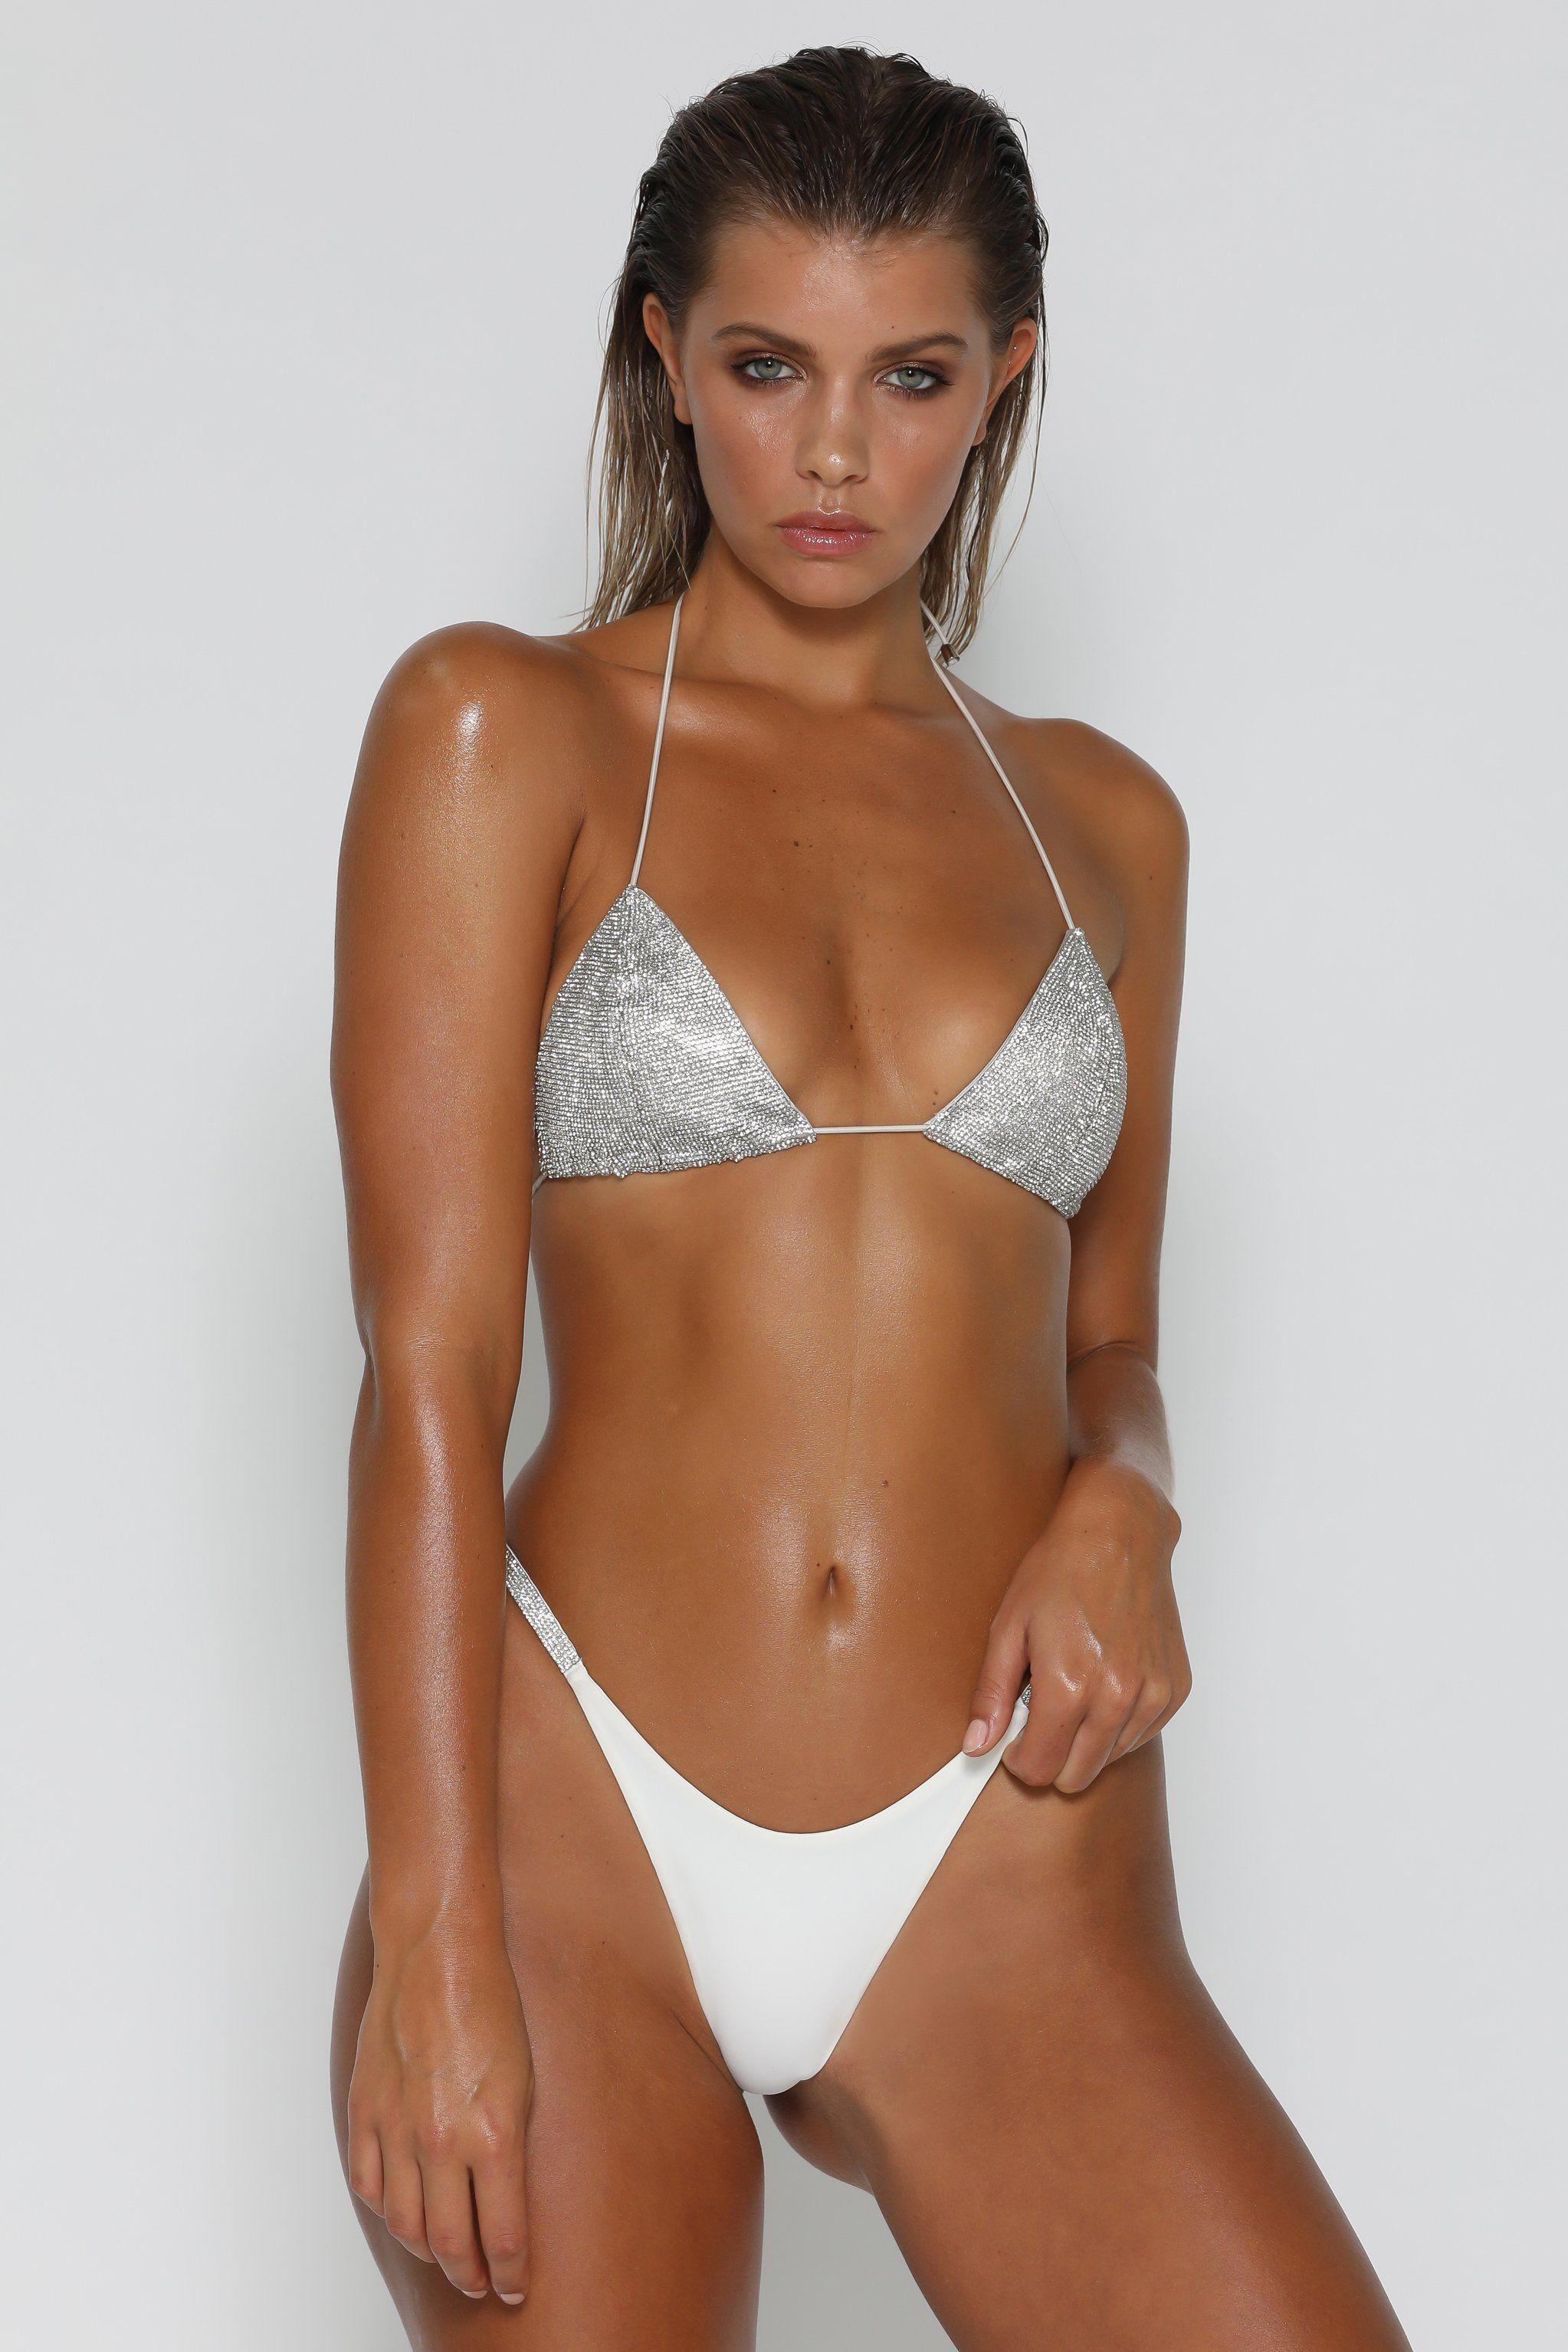 df10a6f2dea11 Sofia Diamante Bikini Top - Silver - MESHKI Diamante Bikini